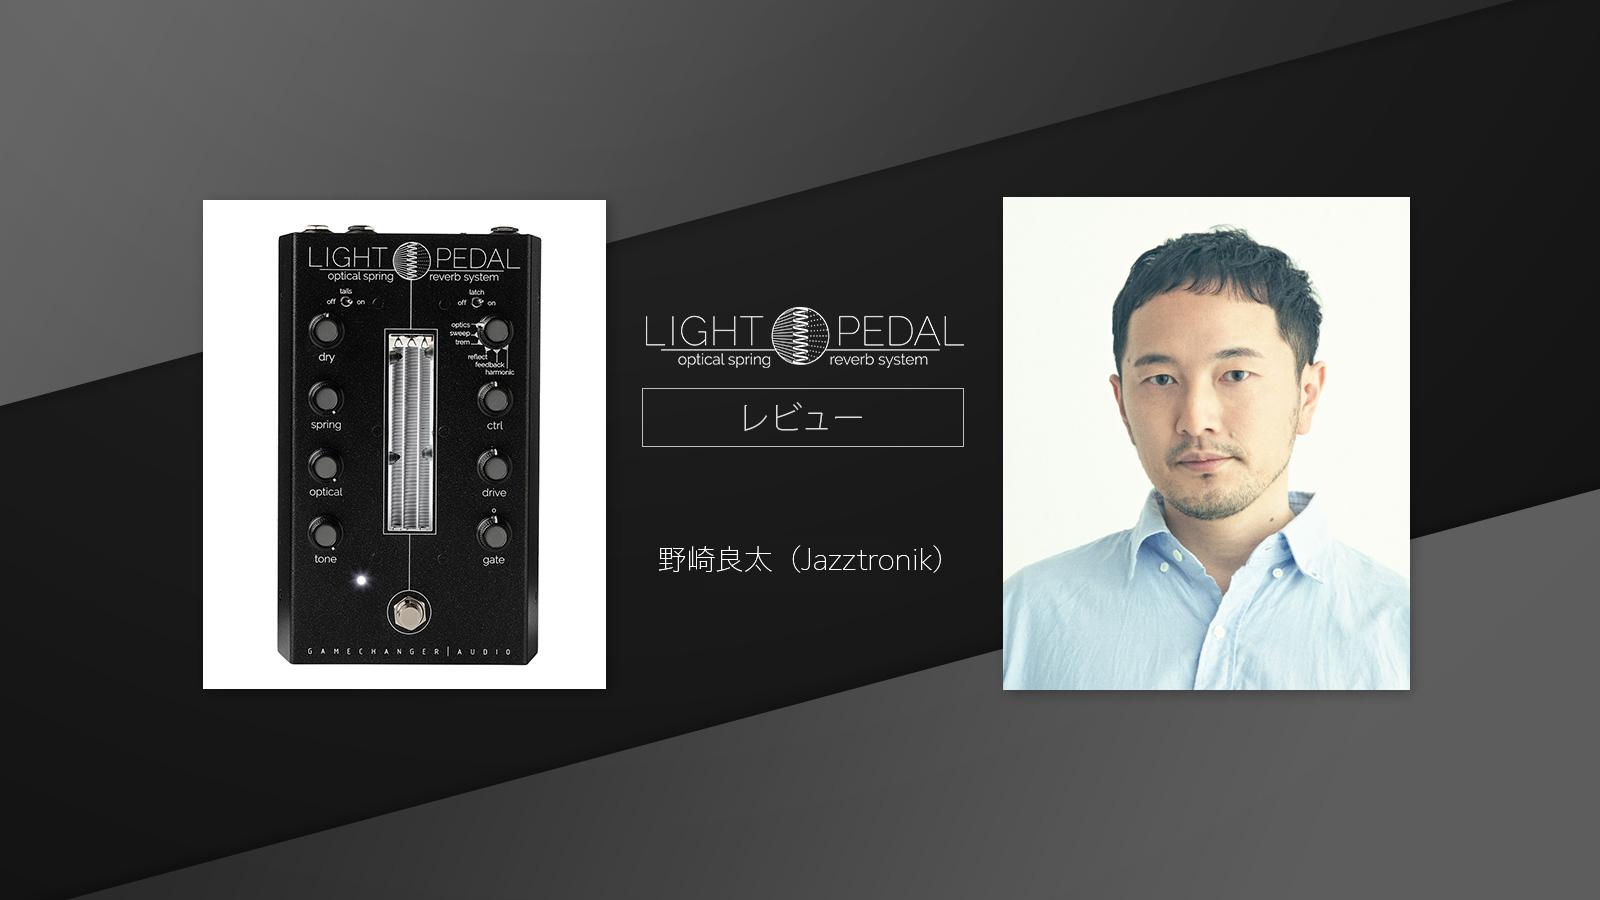 Light Pedal 製品インタビュー:野崎良太(Jazztronik)